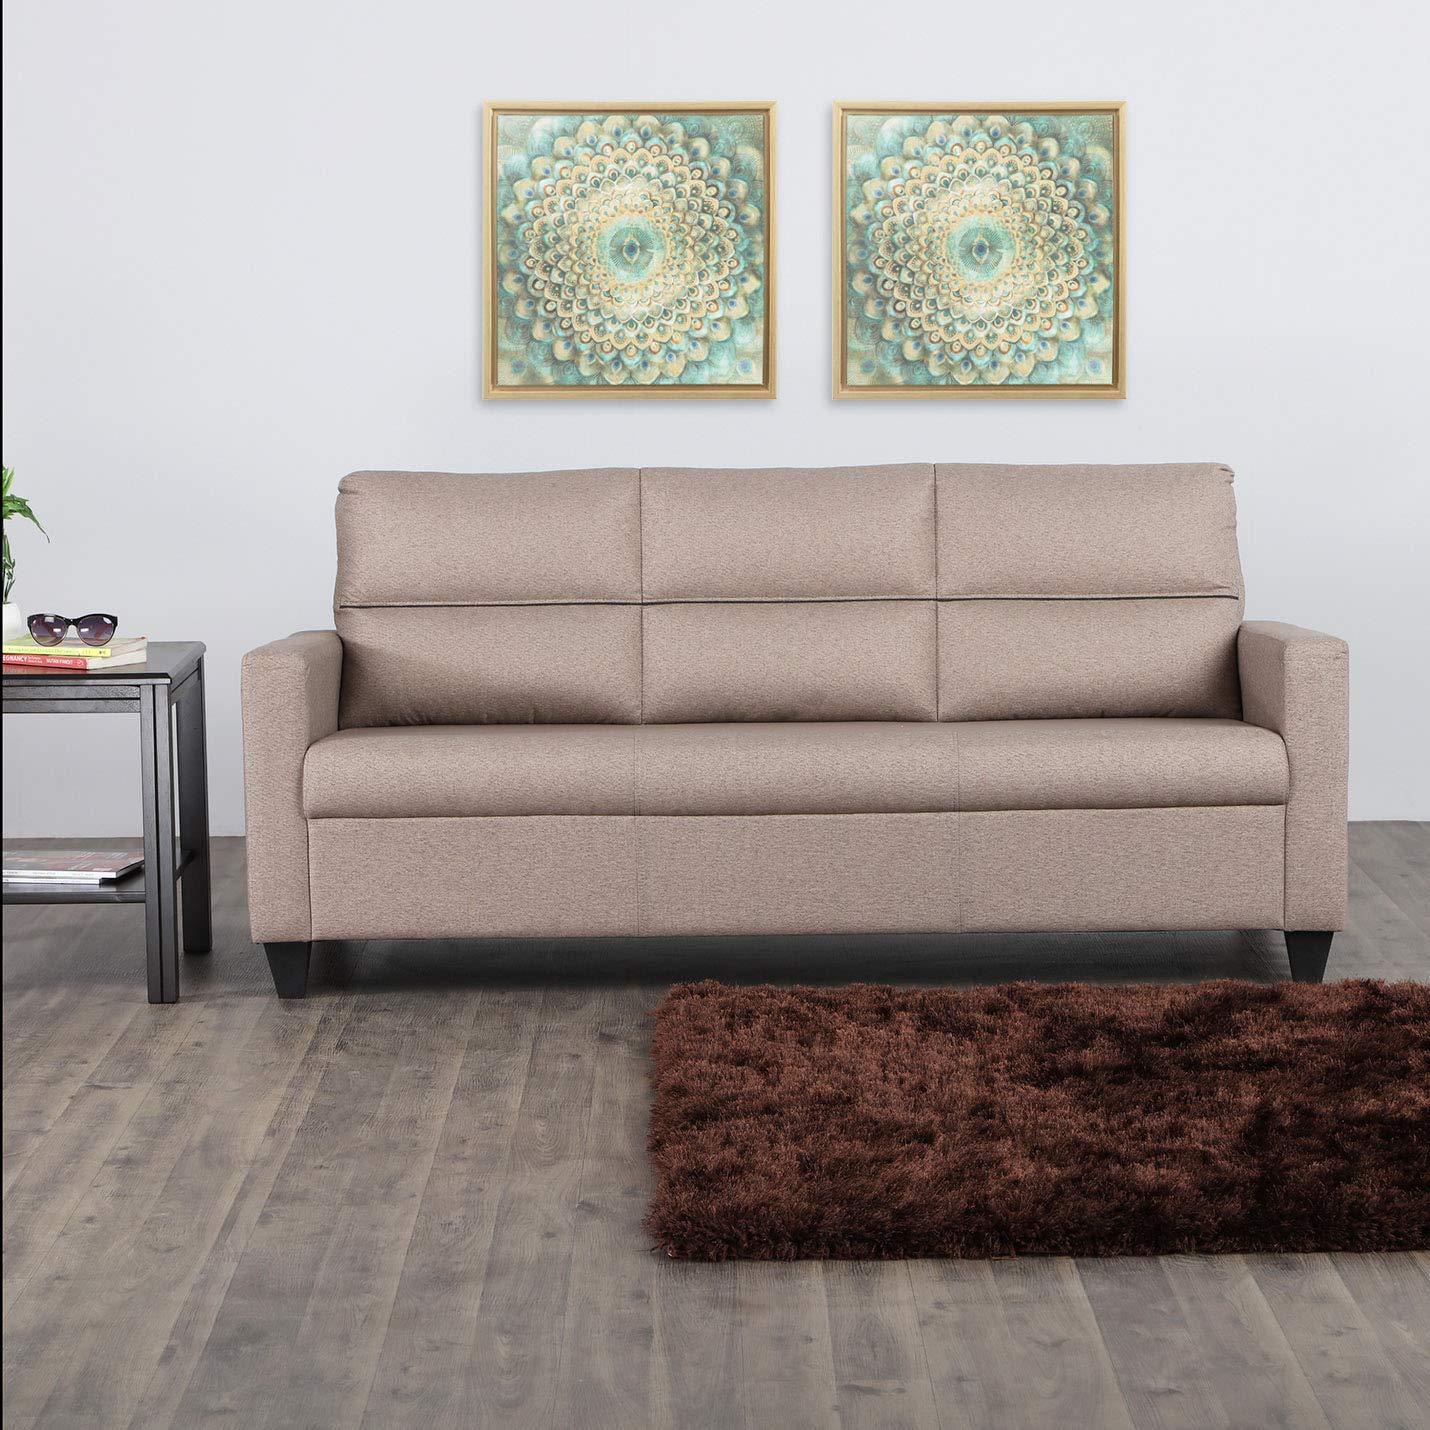 Home Centre Clary Three Seater Sofa